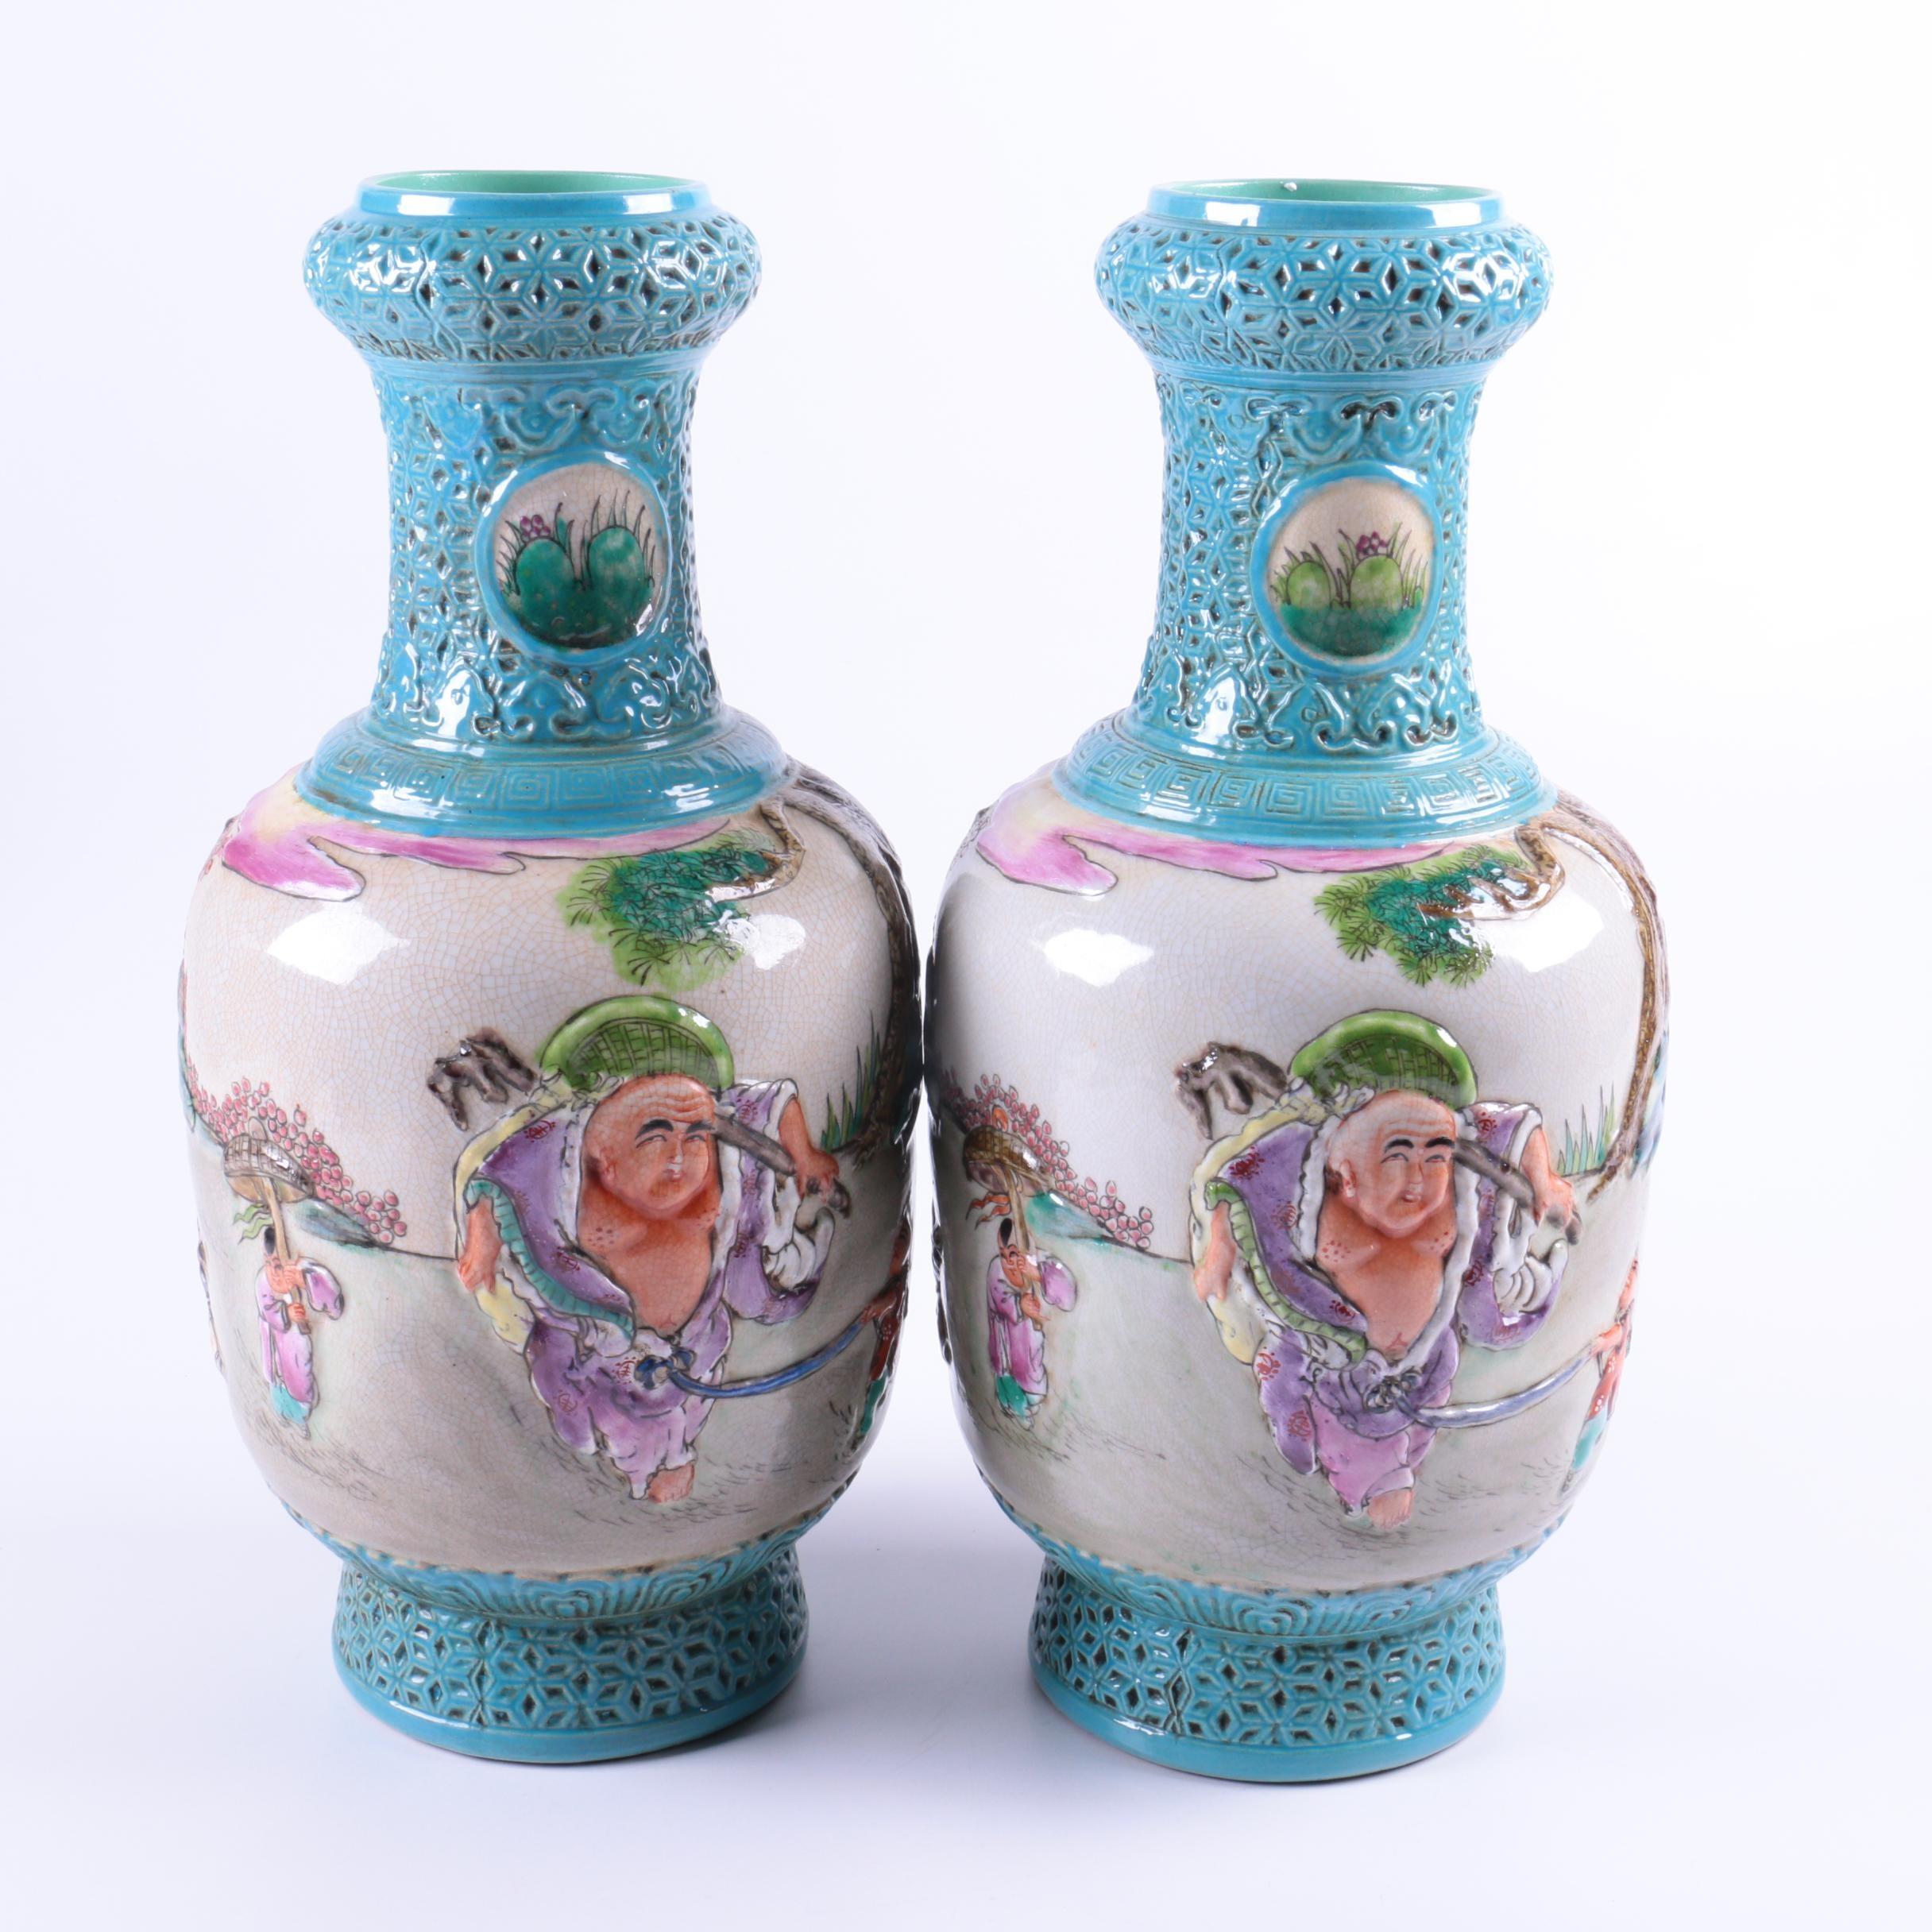 Matching Chinese Porcelain Vases